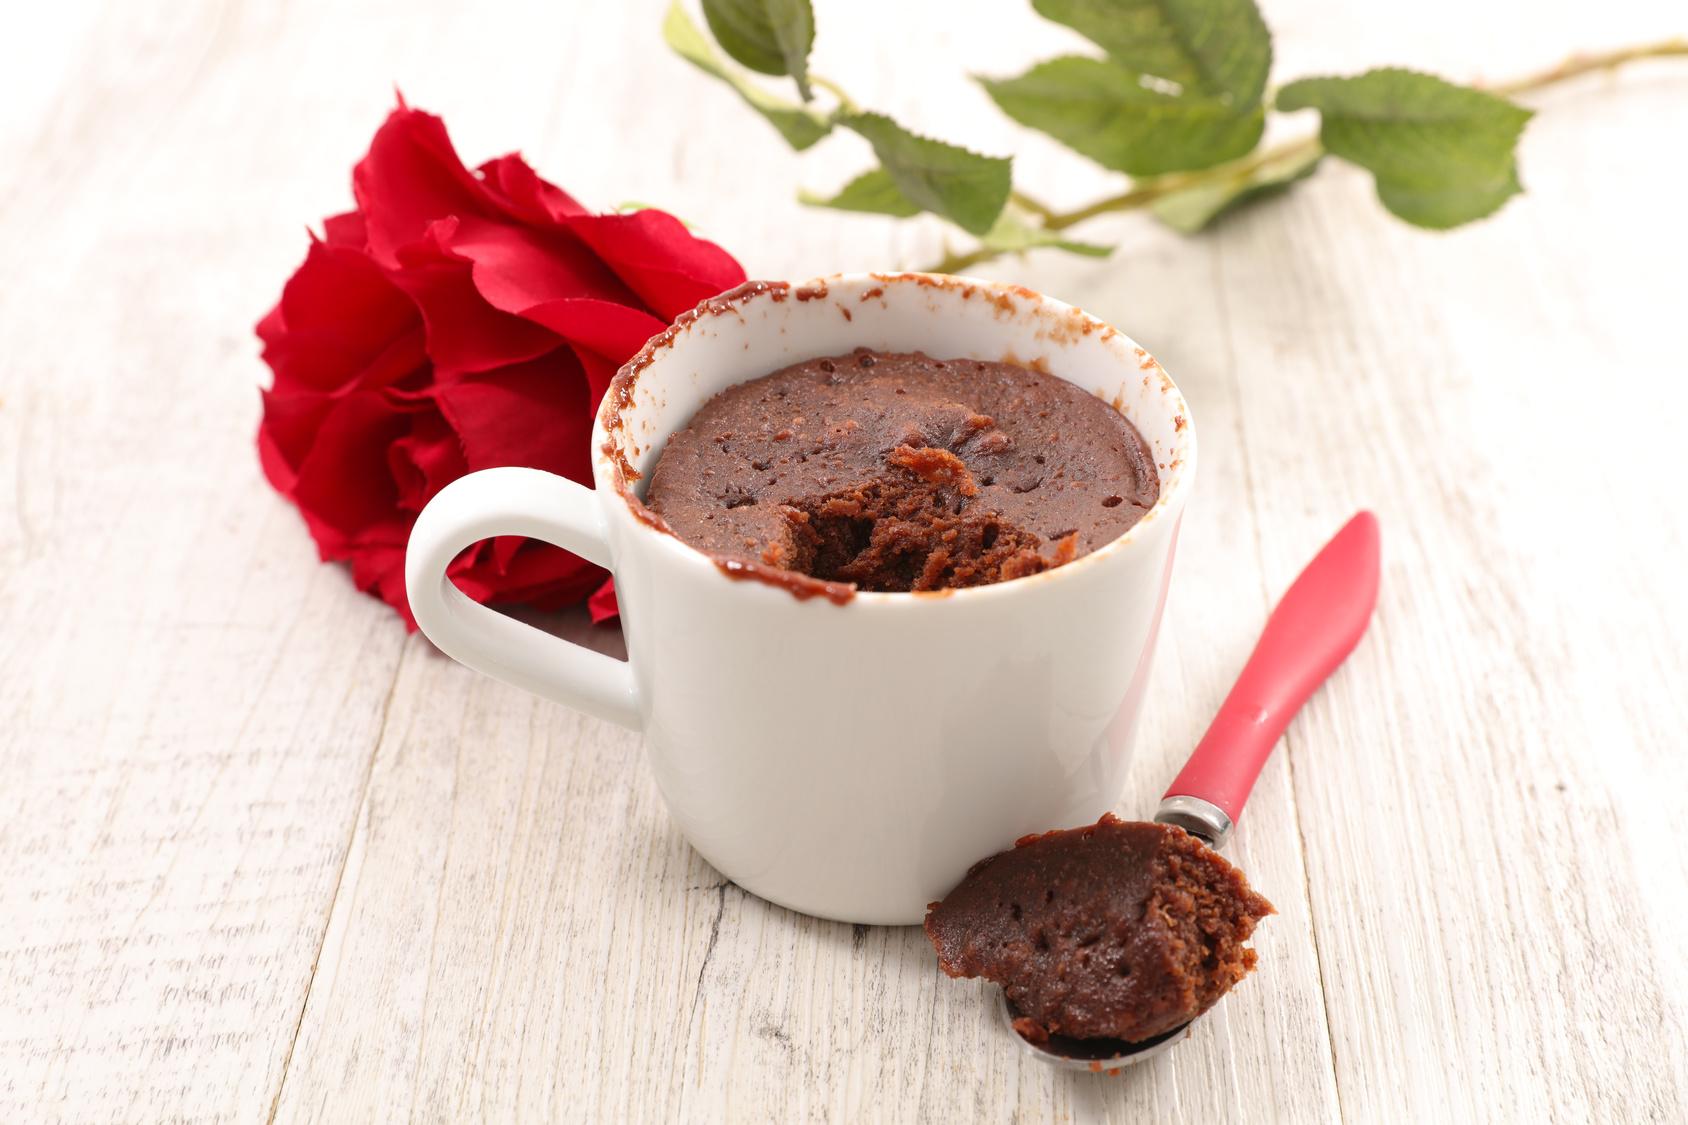 Sugar-free Moist Chocolate Hazelnut Mug Cake